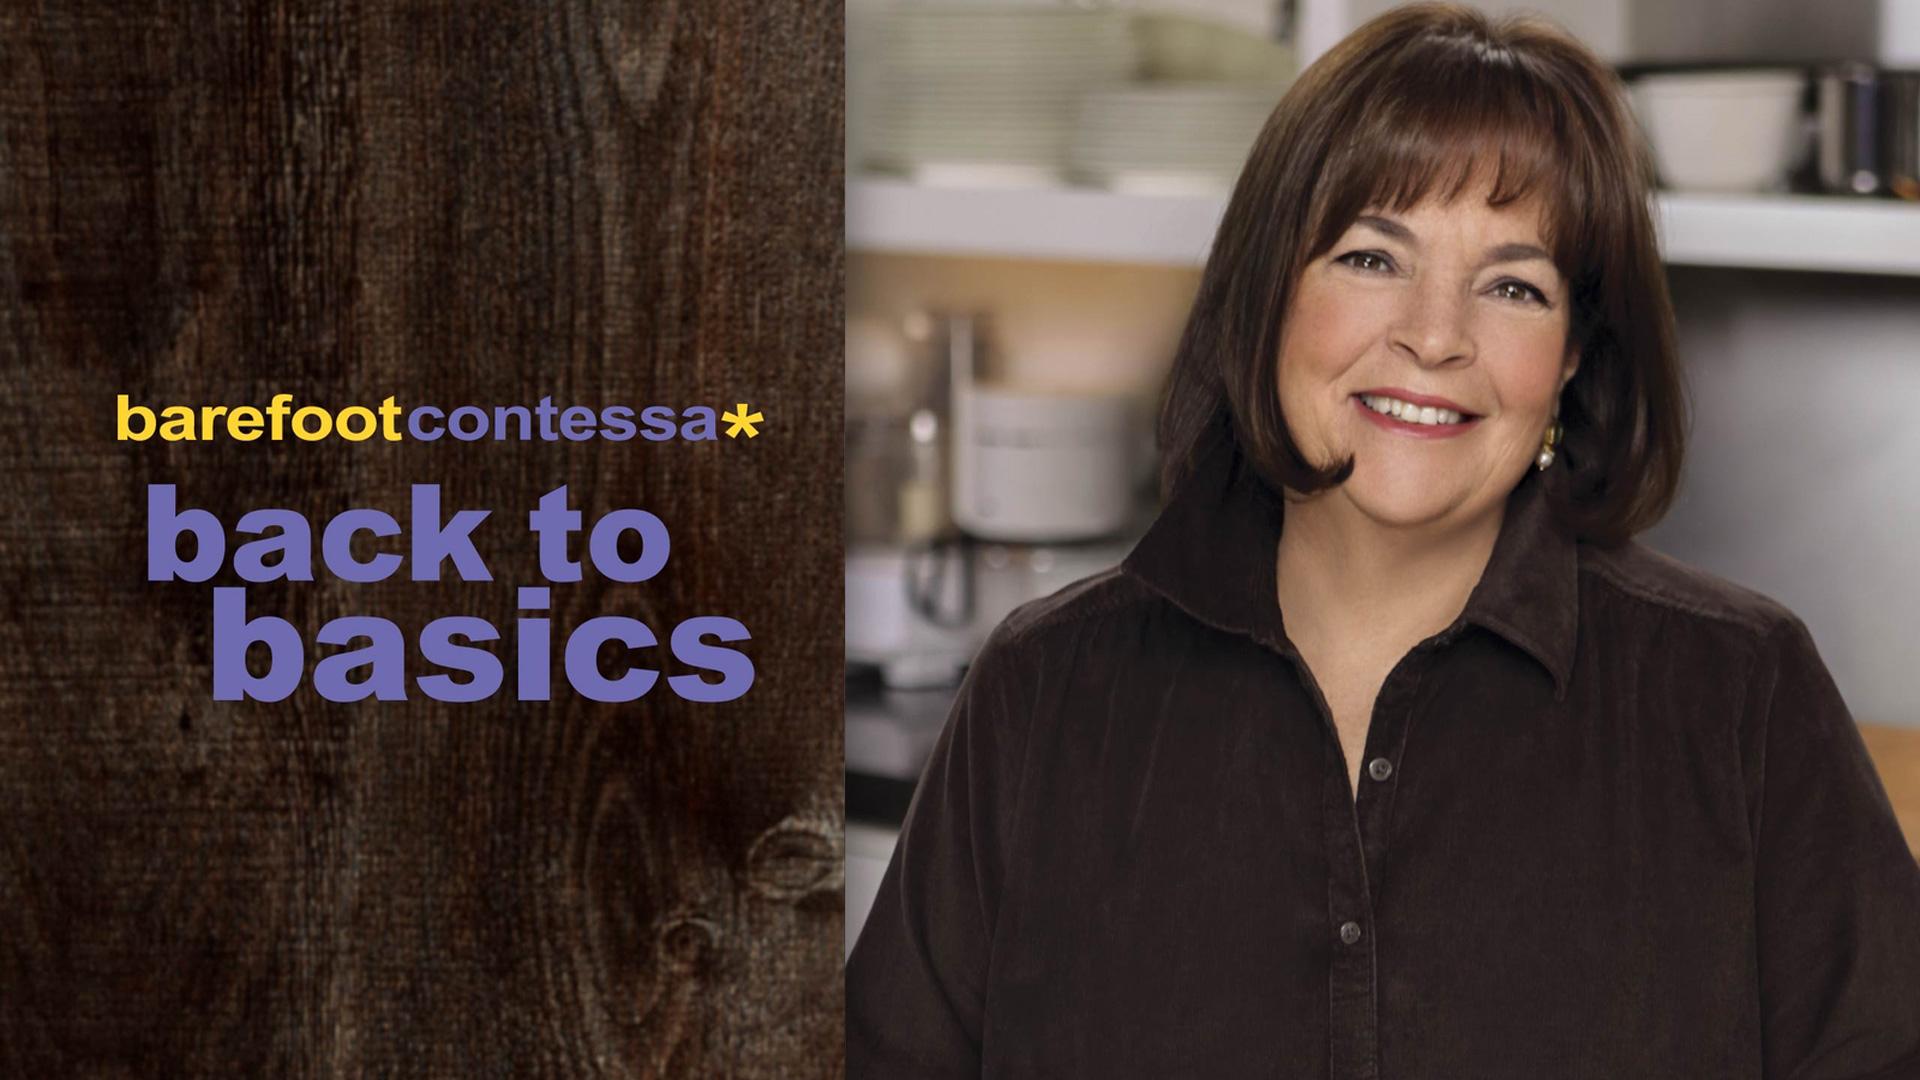 Barefoot Contessa: Back to Basics - Season 1